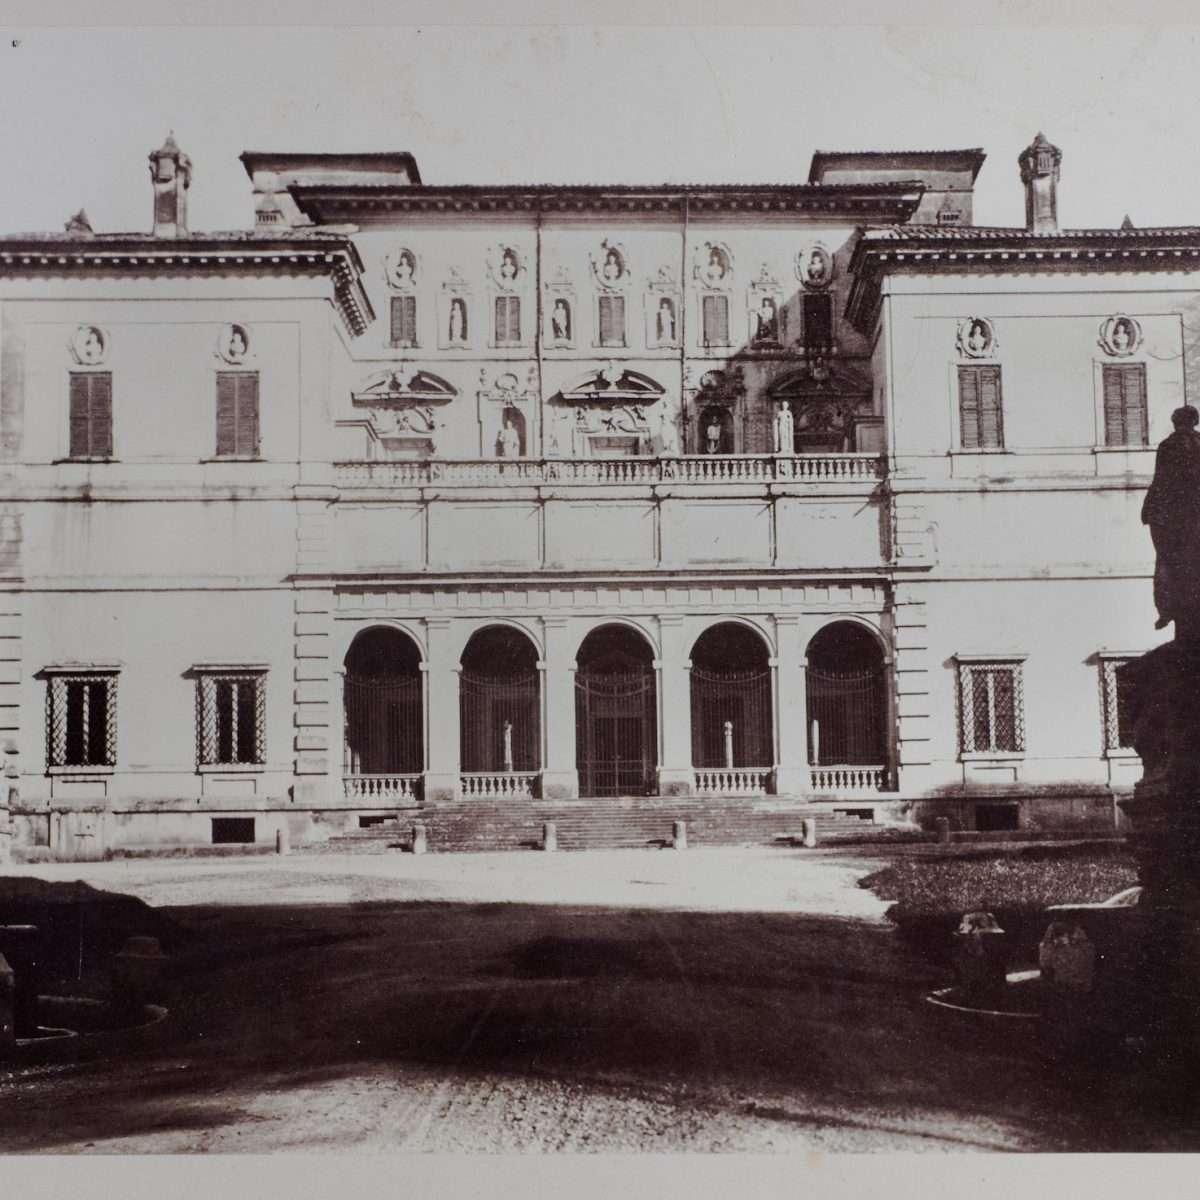 L-1090151 - Galleria Borghese